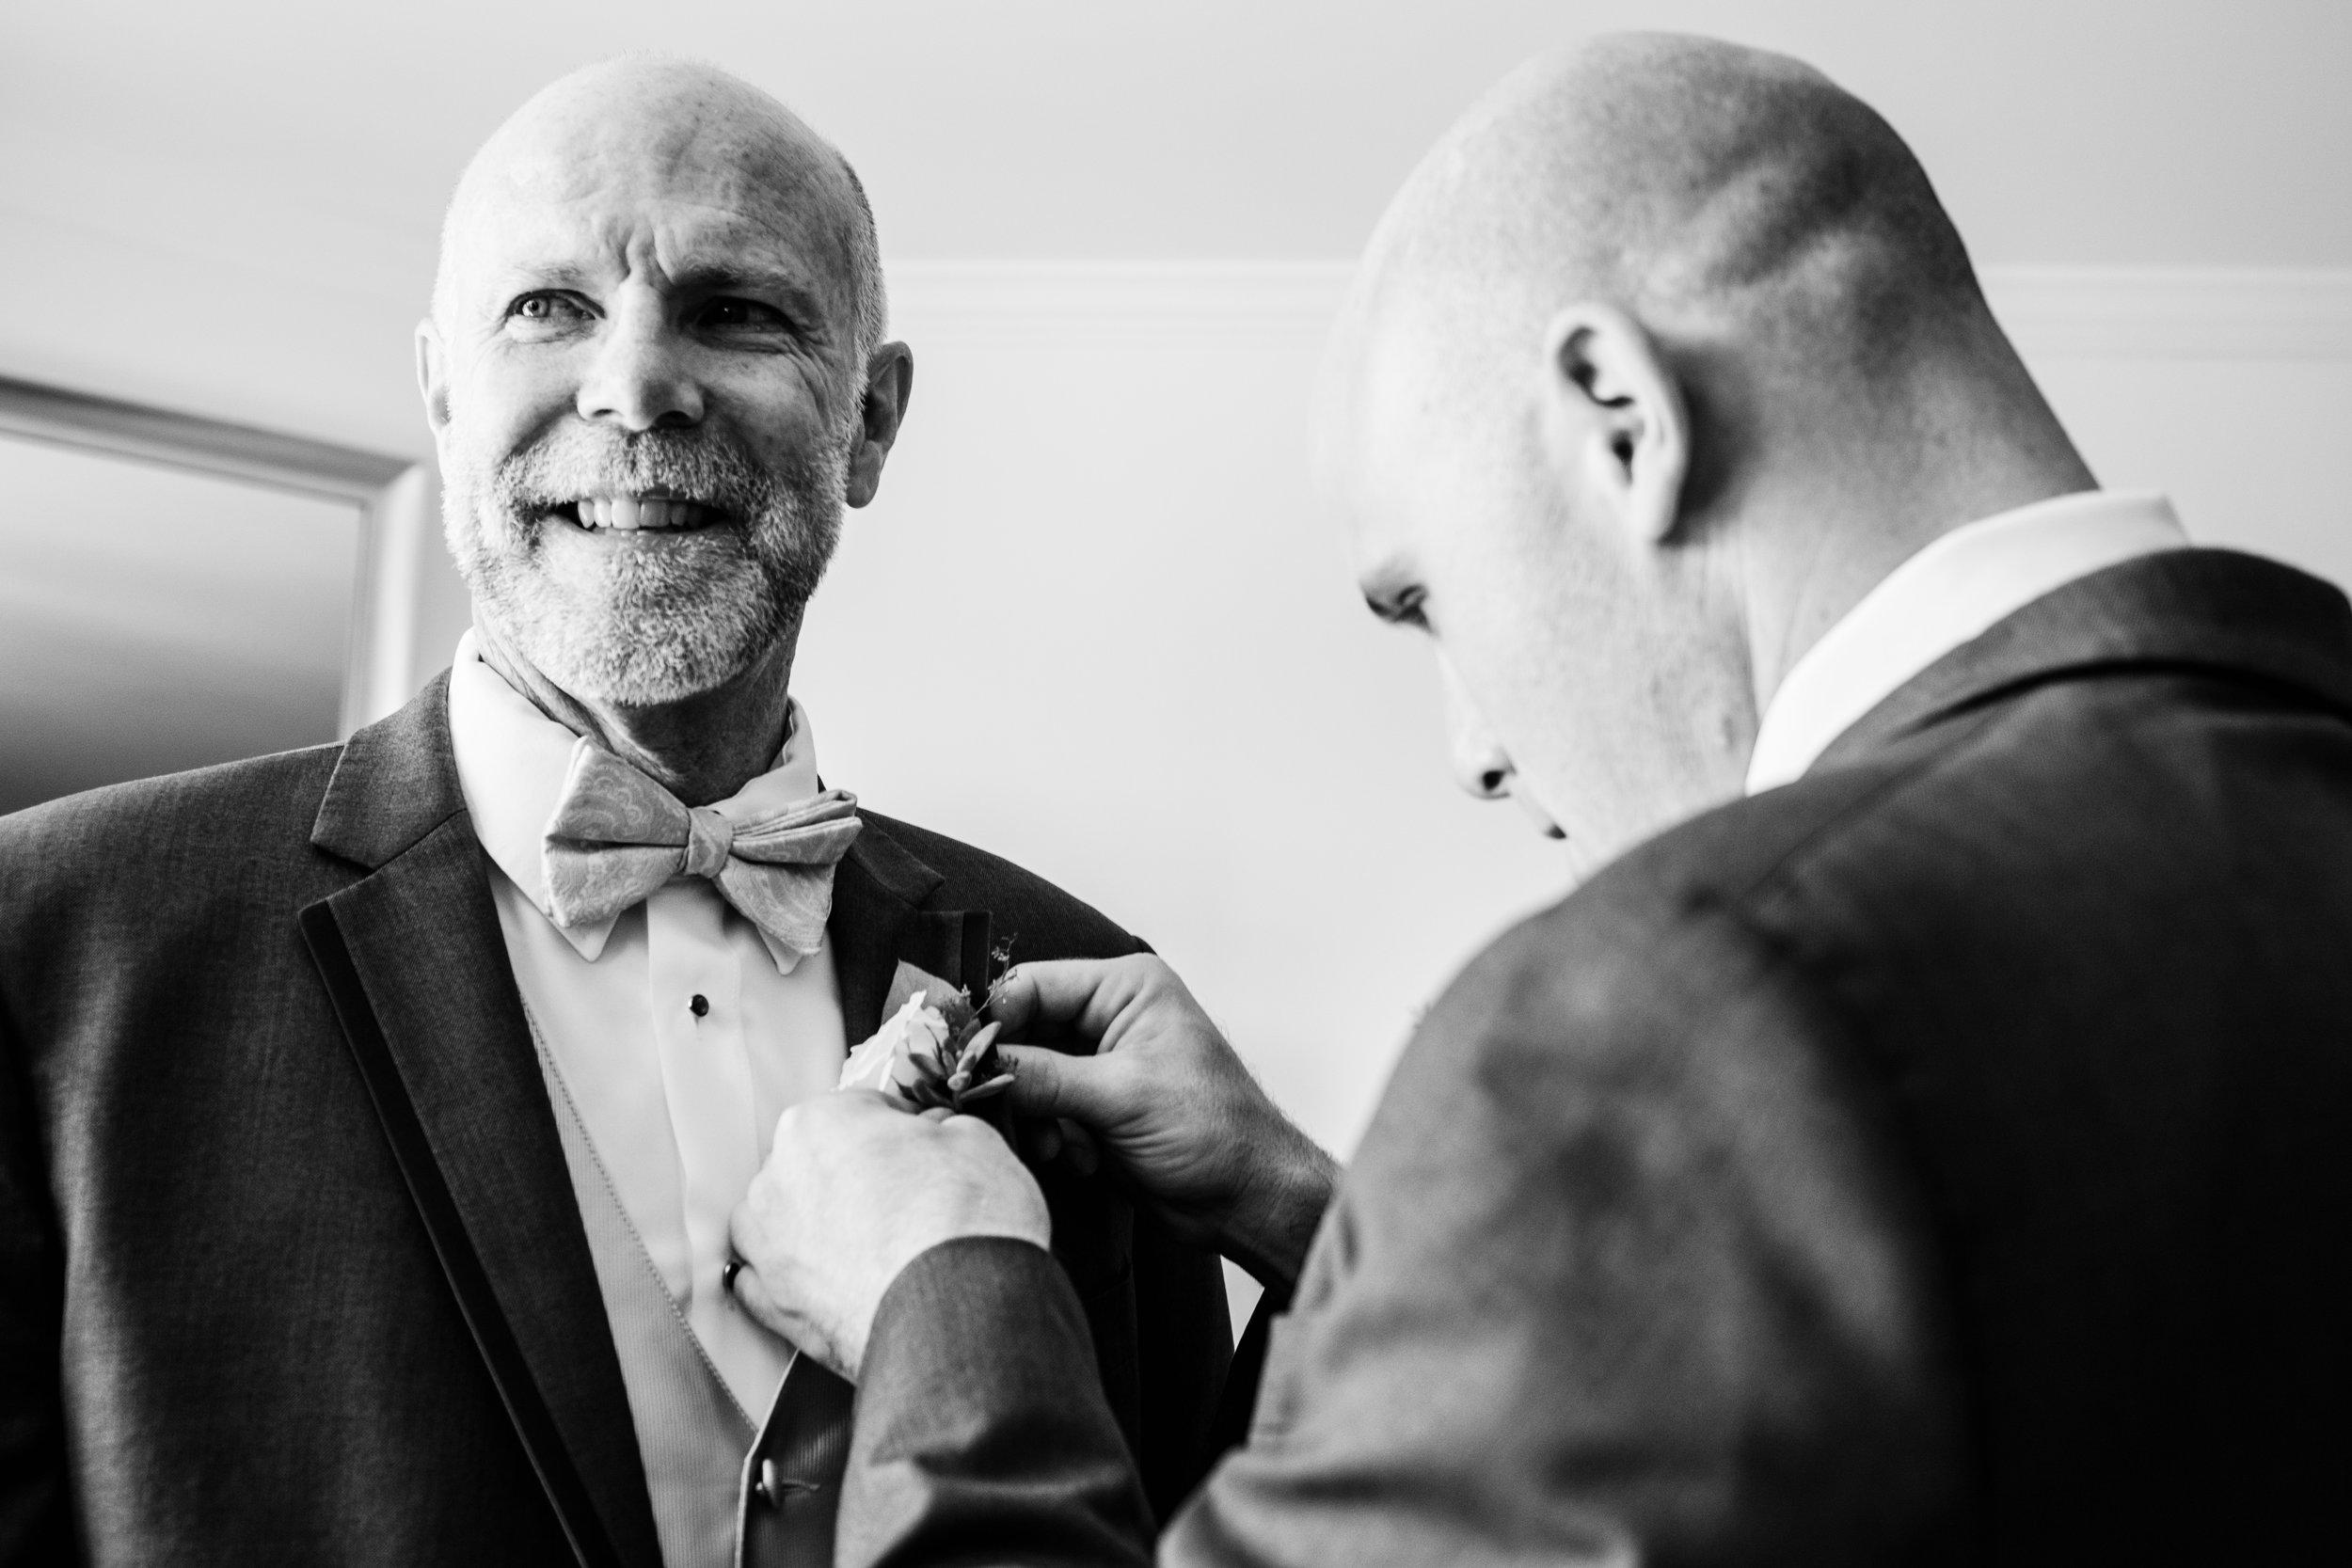 ICONA GOLDEN INN AVALON NJ WEDDING PHOTOGRAPHY  - 012.jpg